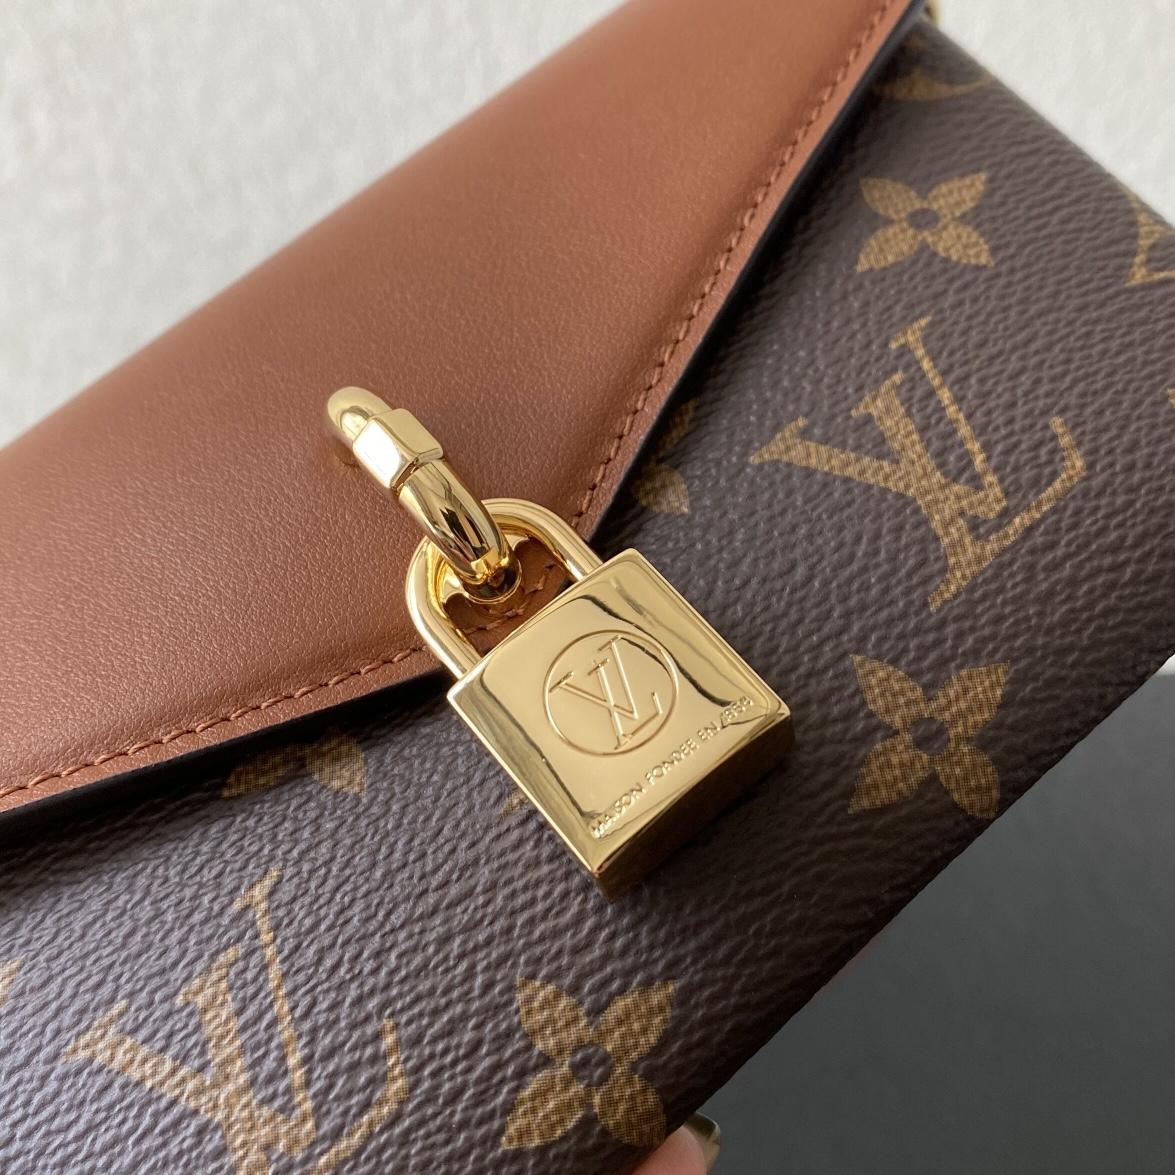 【¥840】LV最新小单品锁头包80763 小巧精致 一包多用